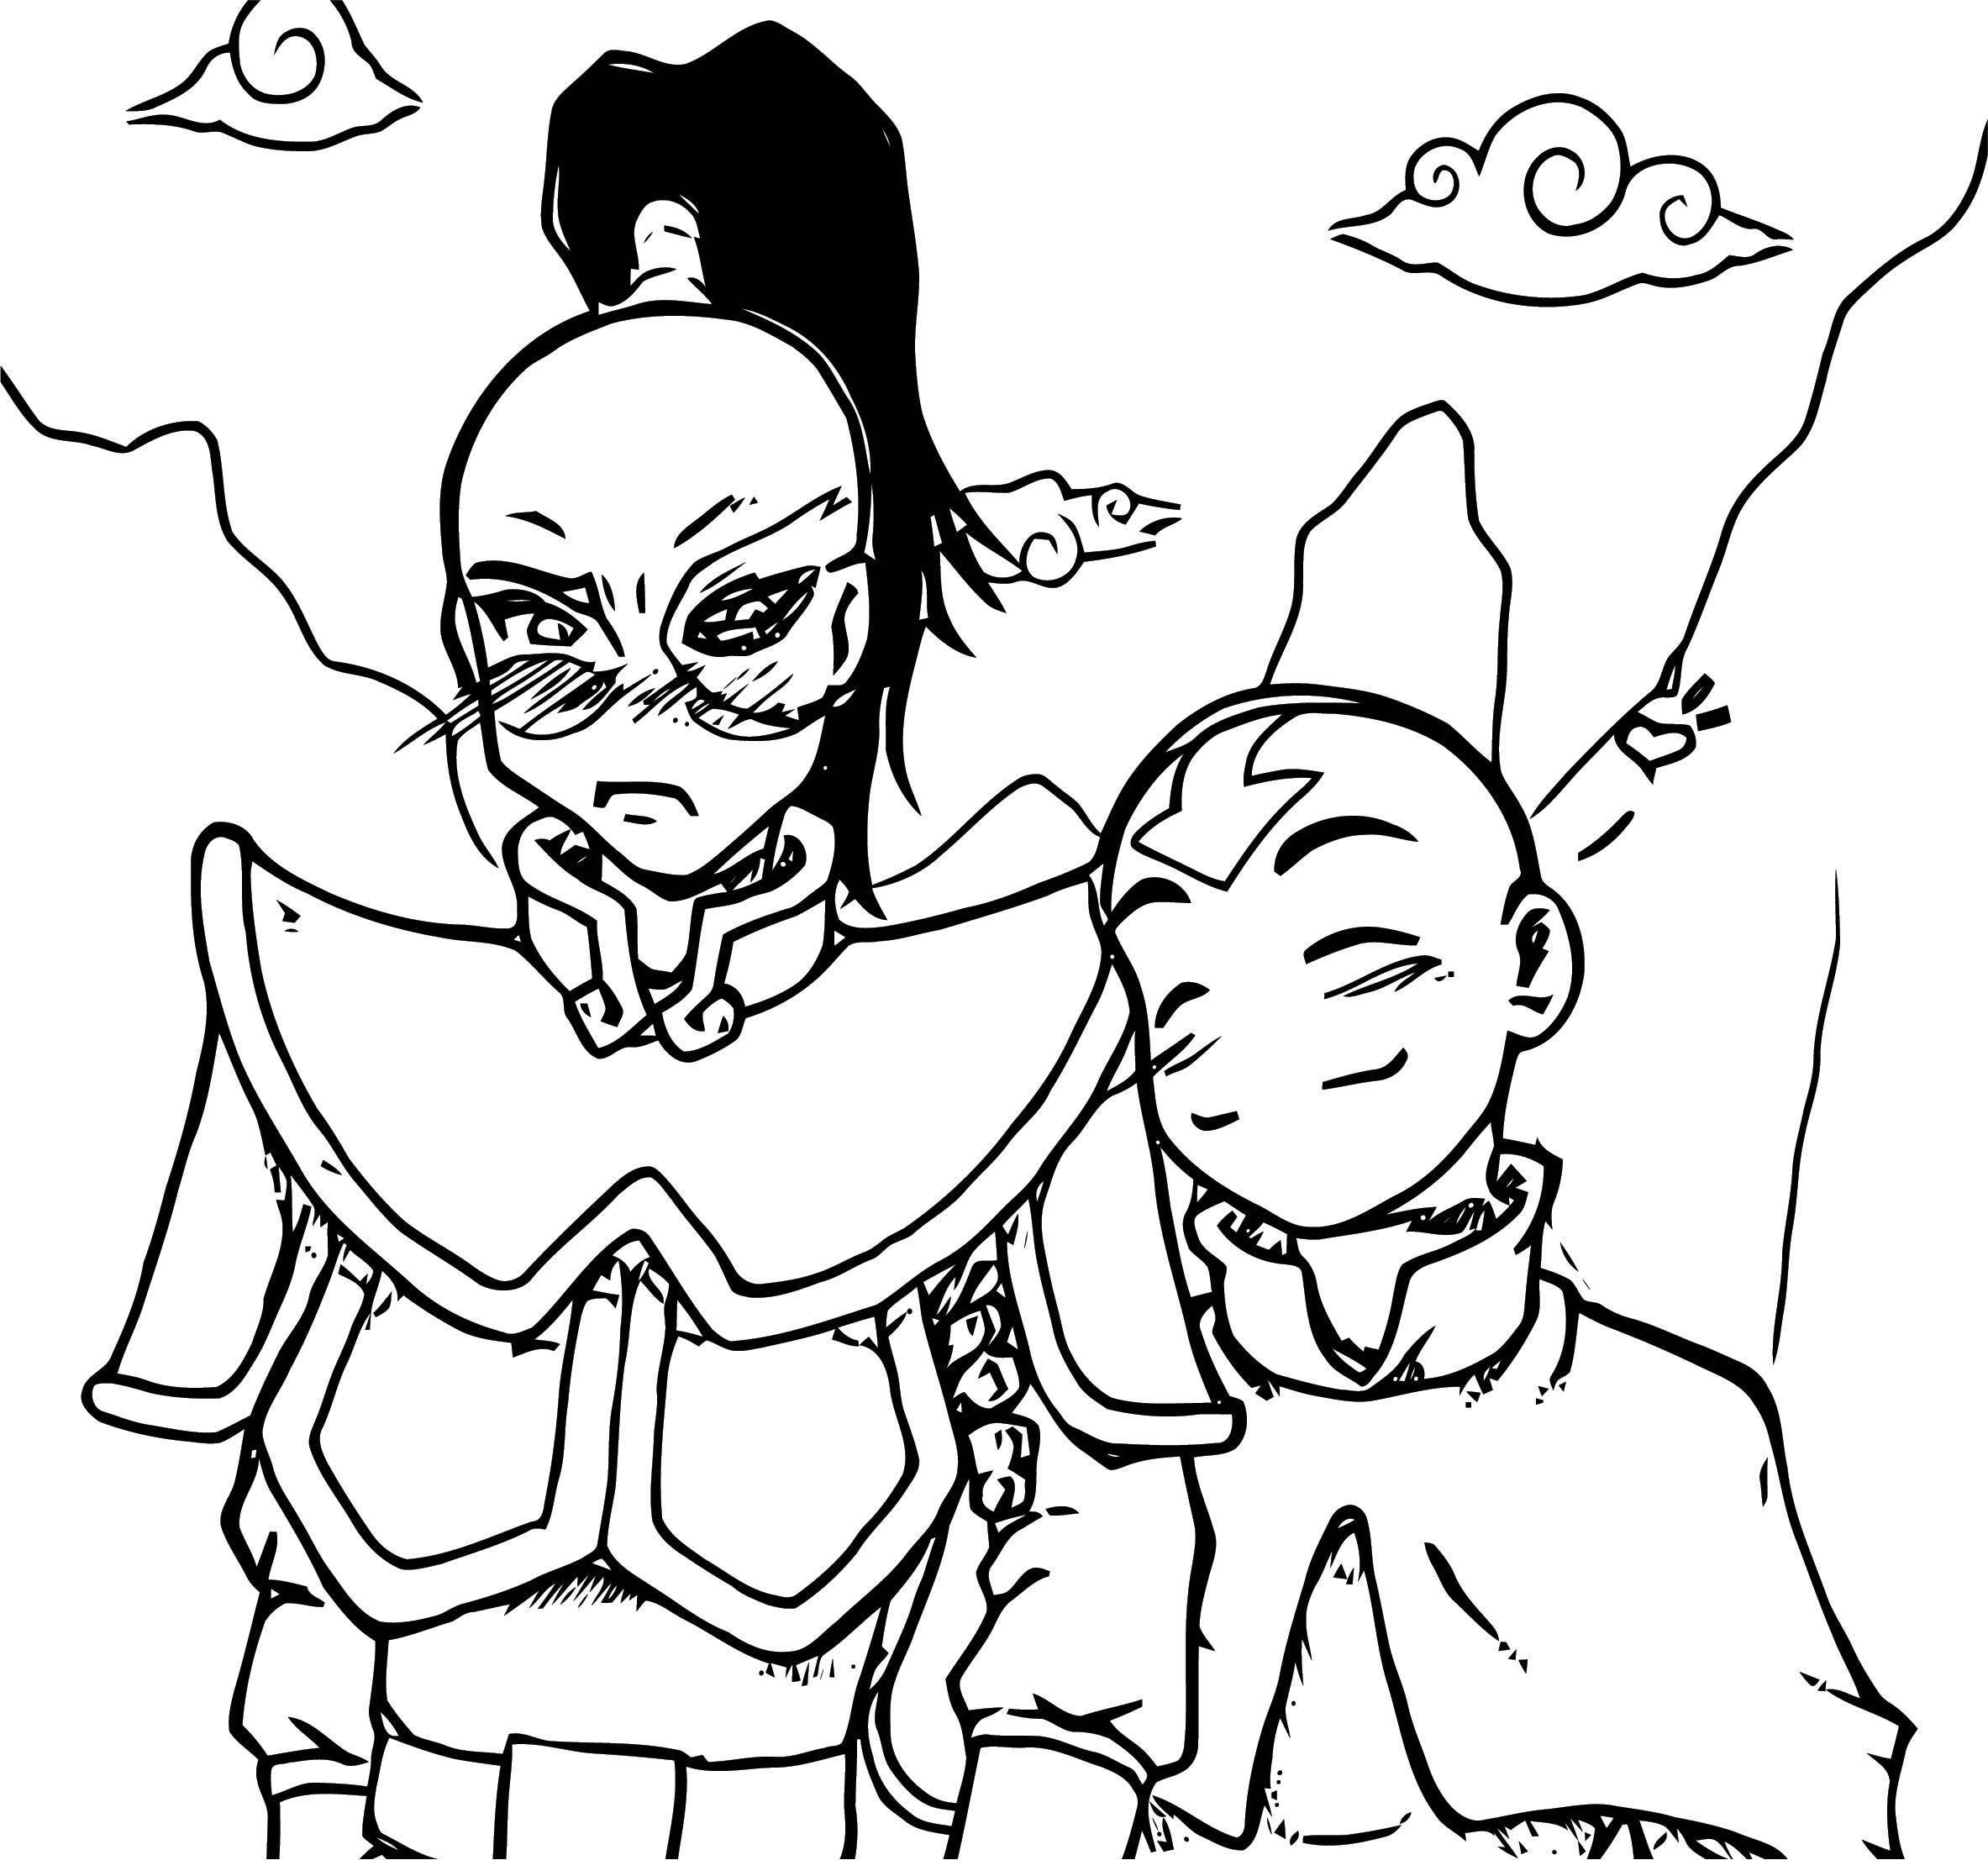 Avatar Aang Coloring Page: Aang Hearts Zuko Kole Avatar Aang Coloring Page